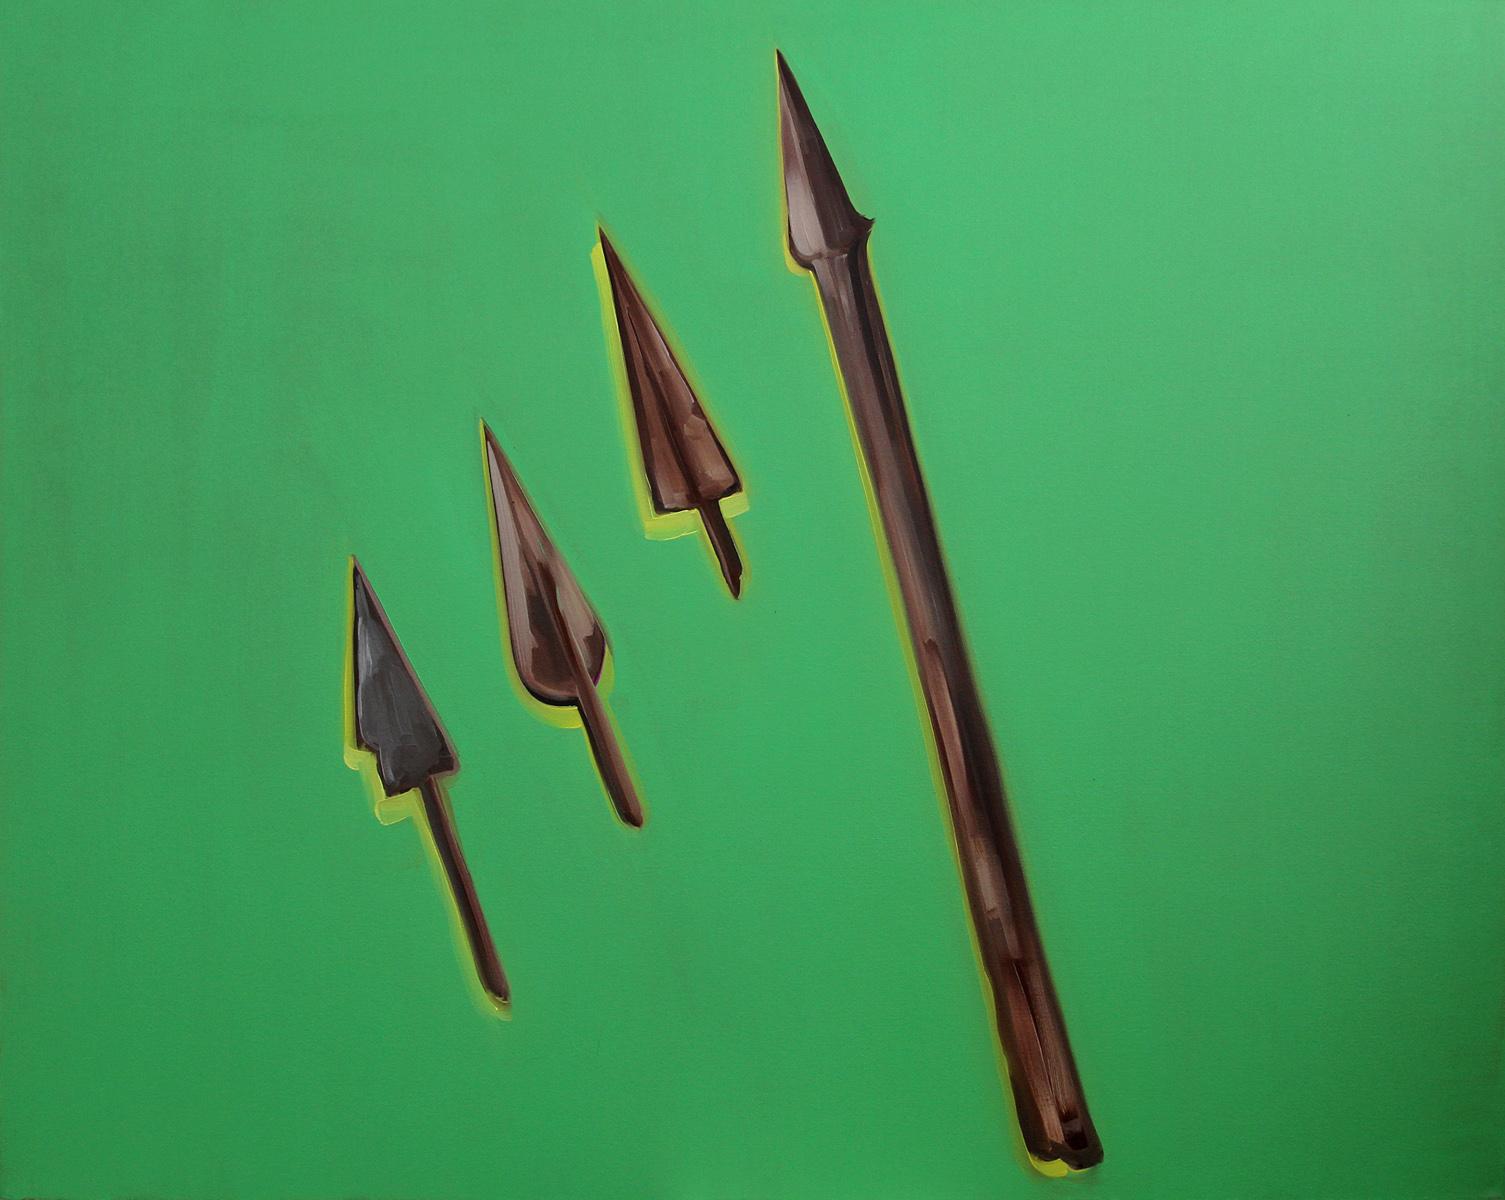 Untitled (Arrow Heads)